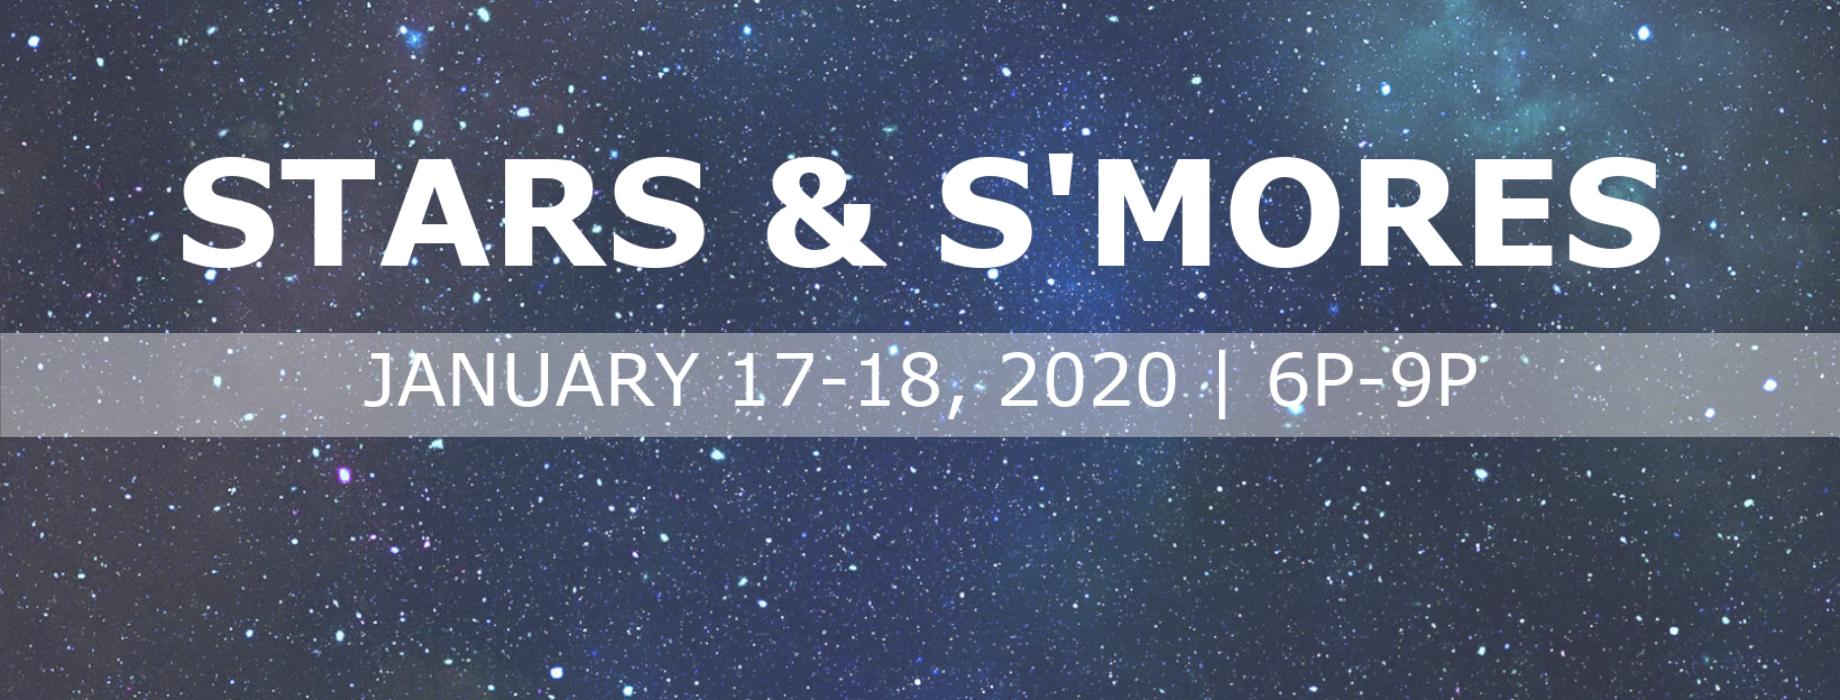 Stars & S'mores - January 17 & 18, 2020 | 6p-9p